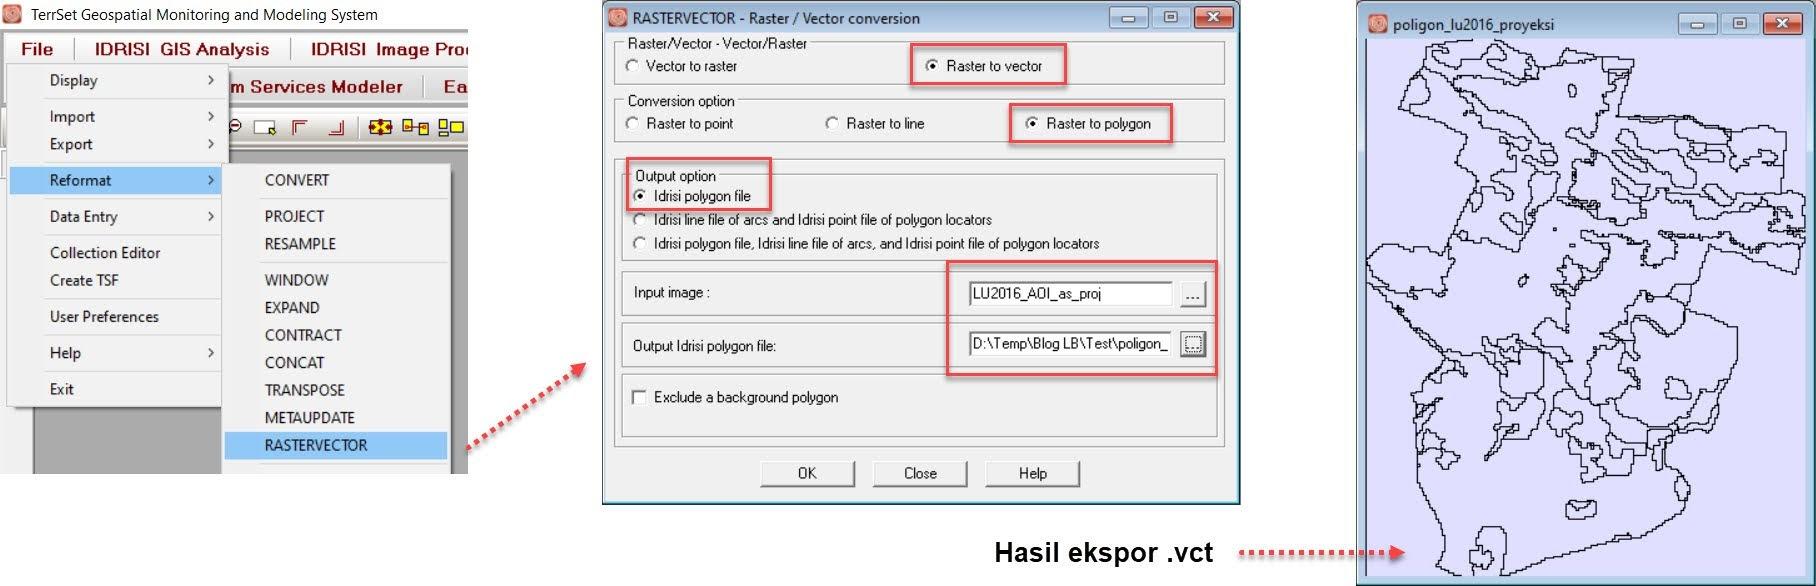 Proses raster to vector